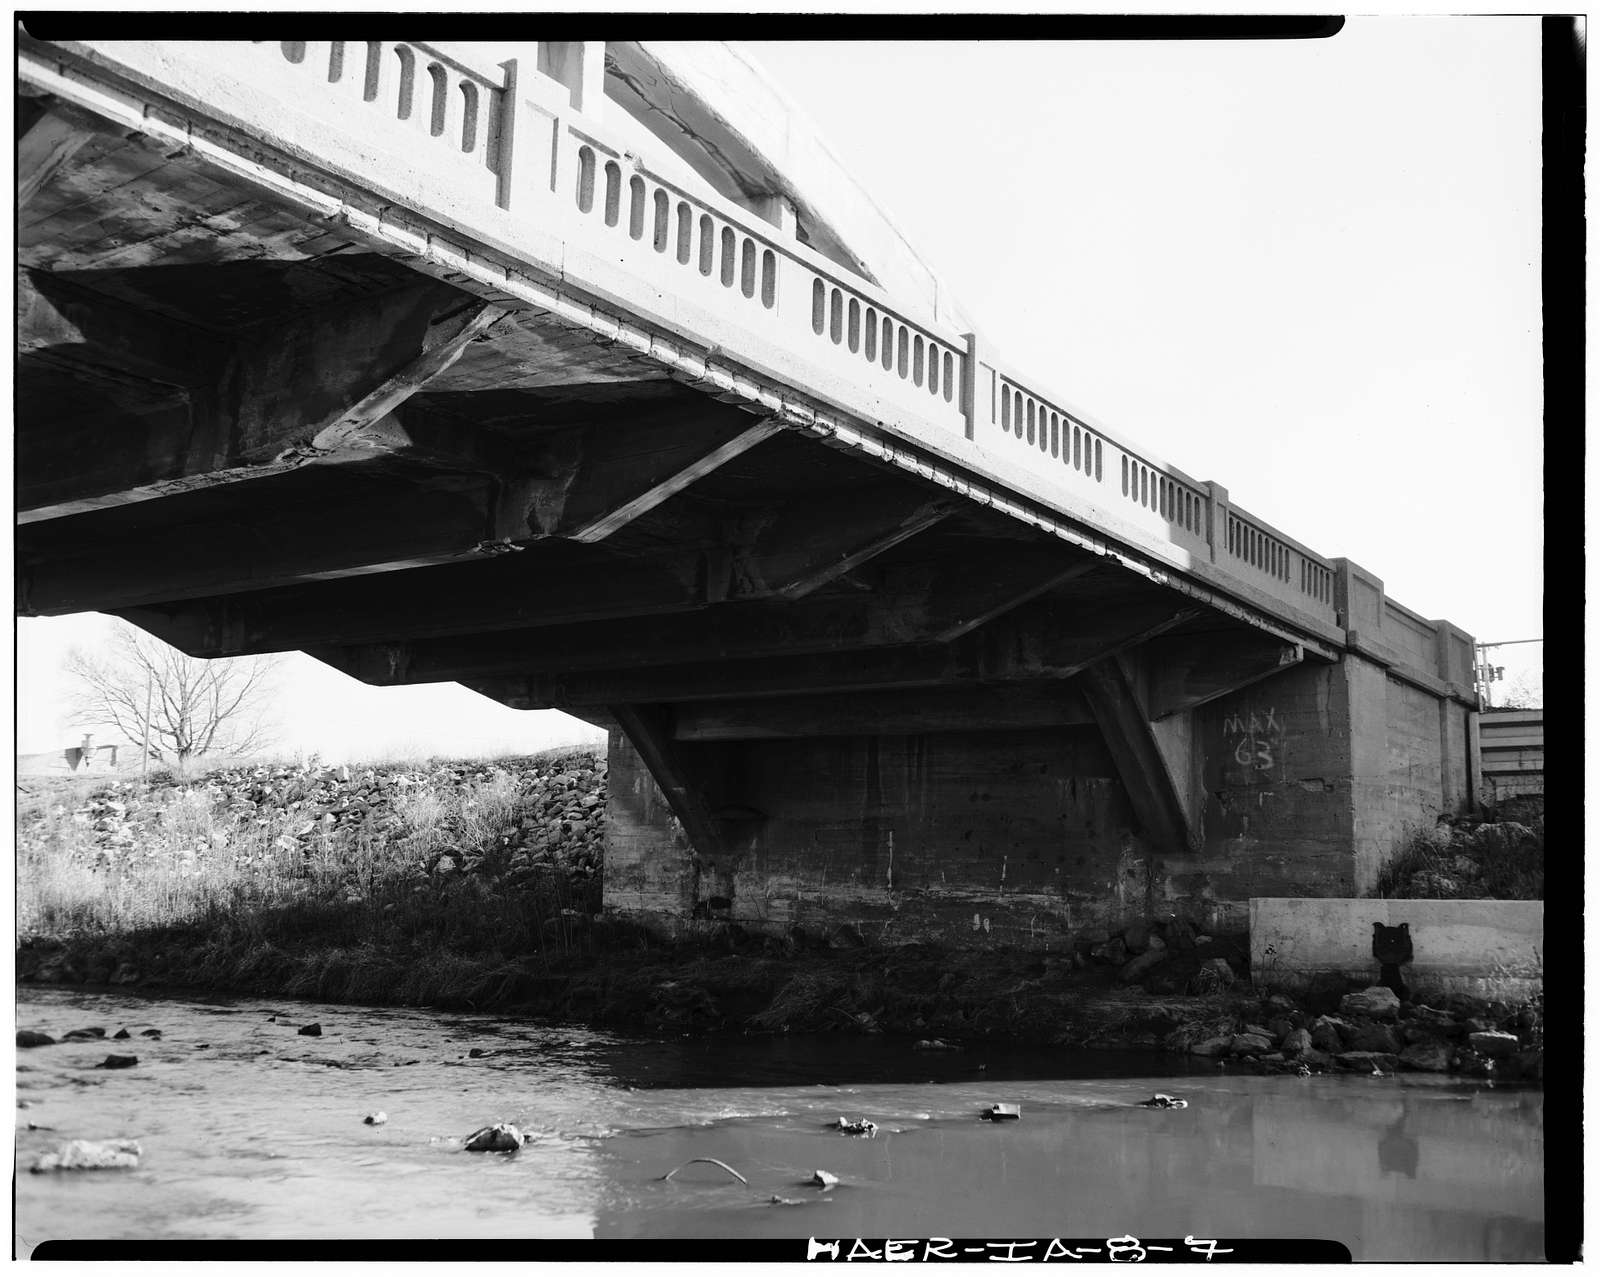 South Third Avenue Bridge, Marshalltown, Marshall County, IA